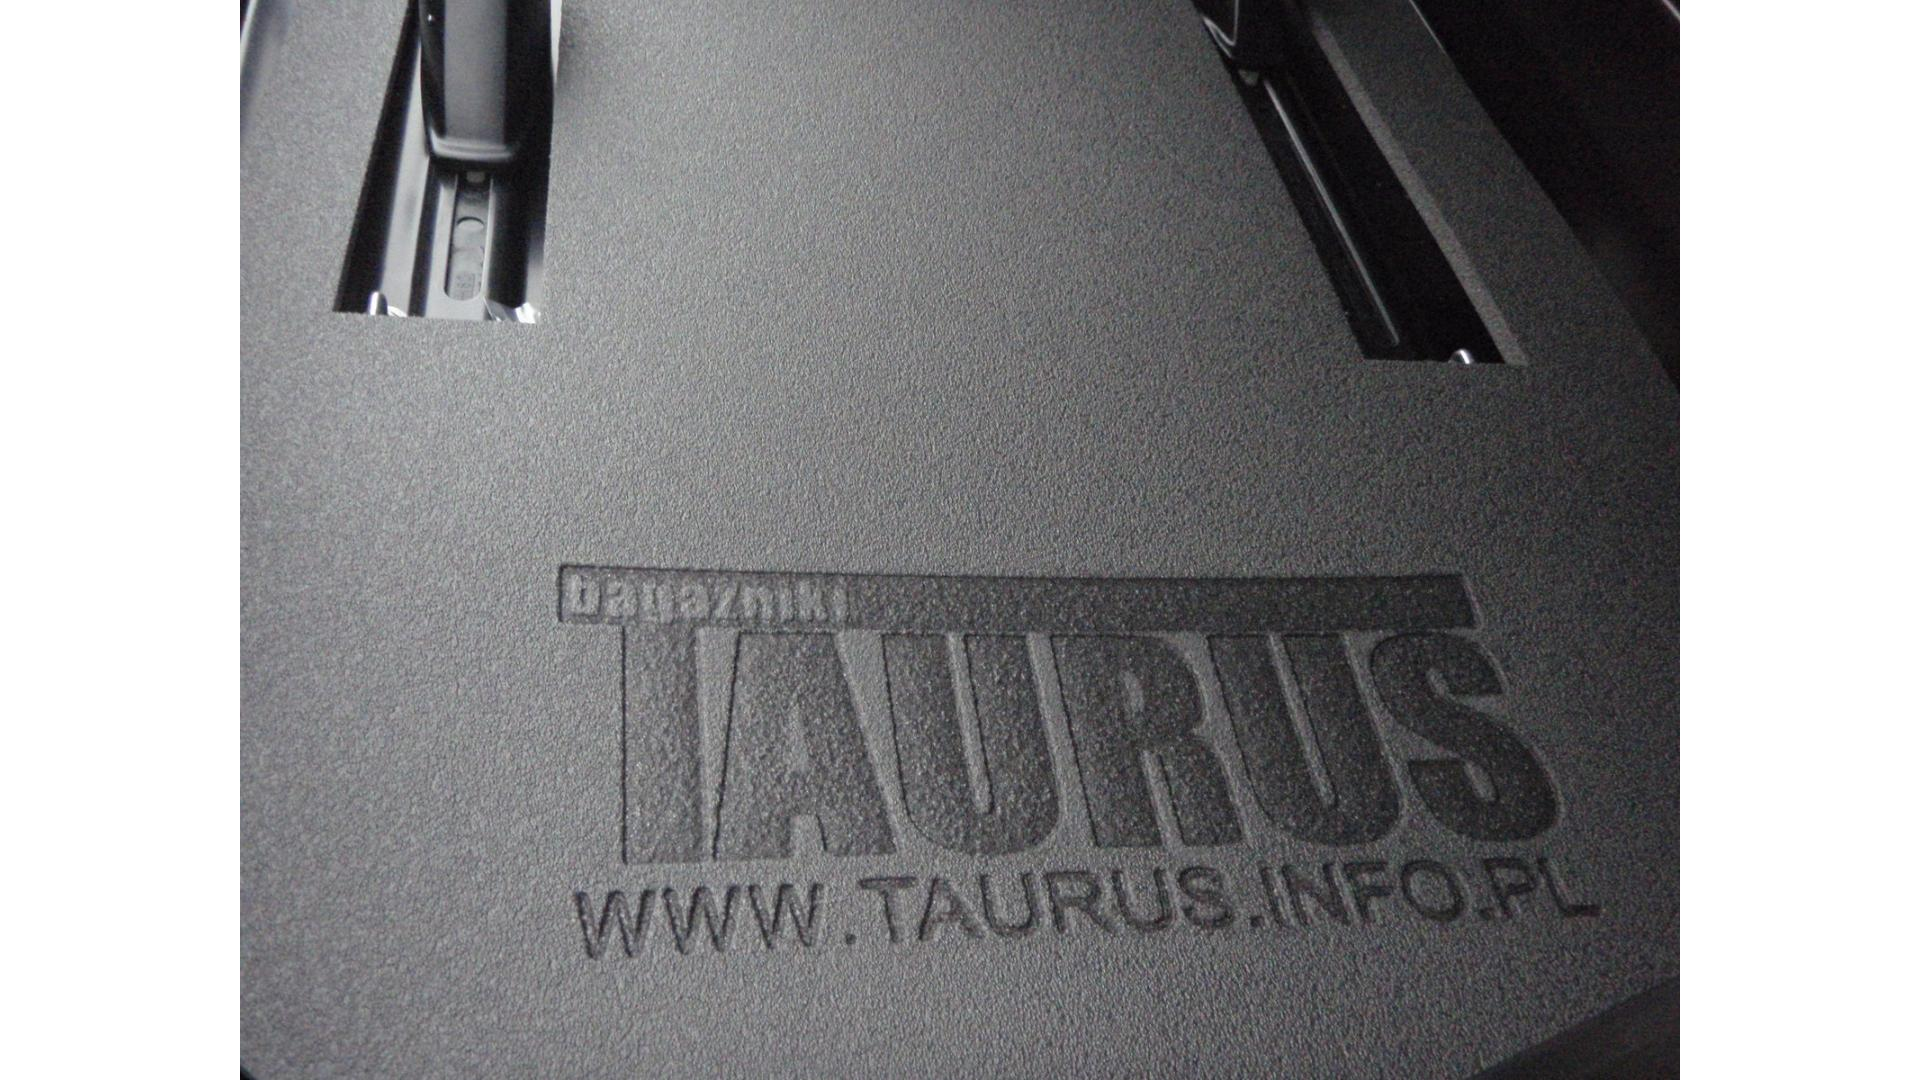 Taurus ochranná vložka do boxu A 780  (173x65 cm)